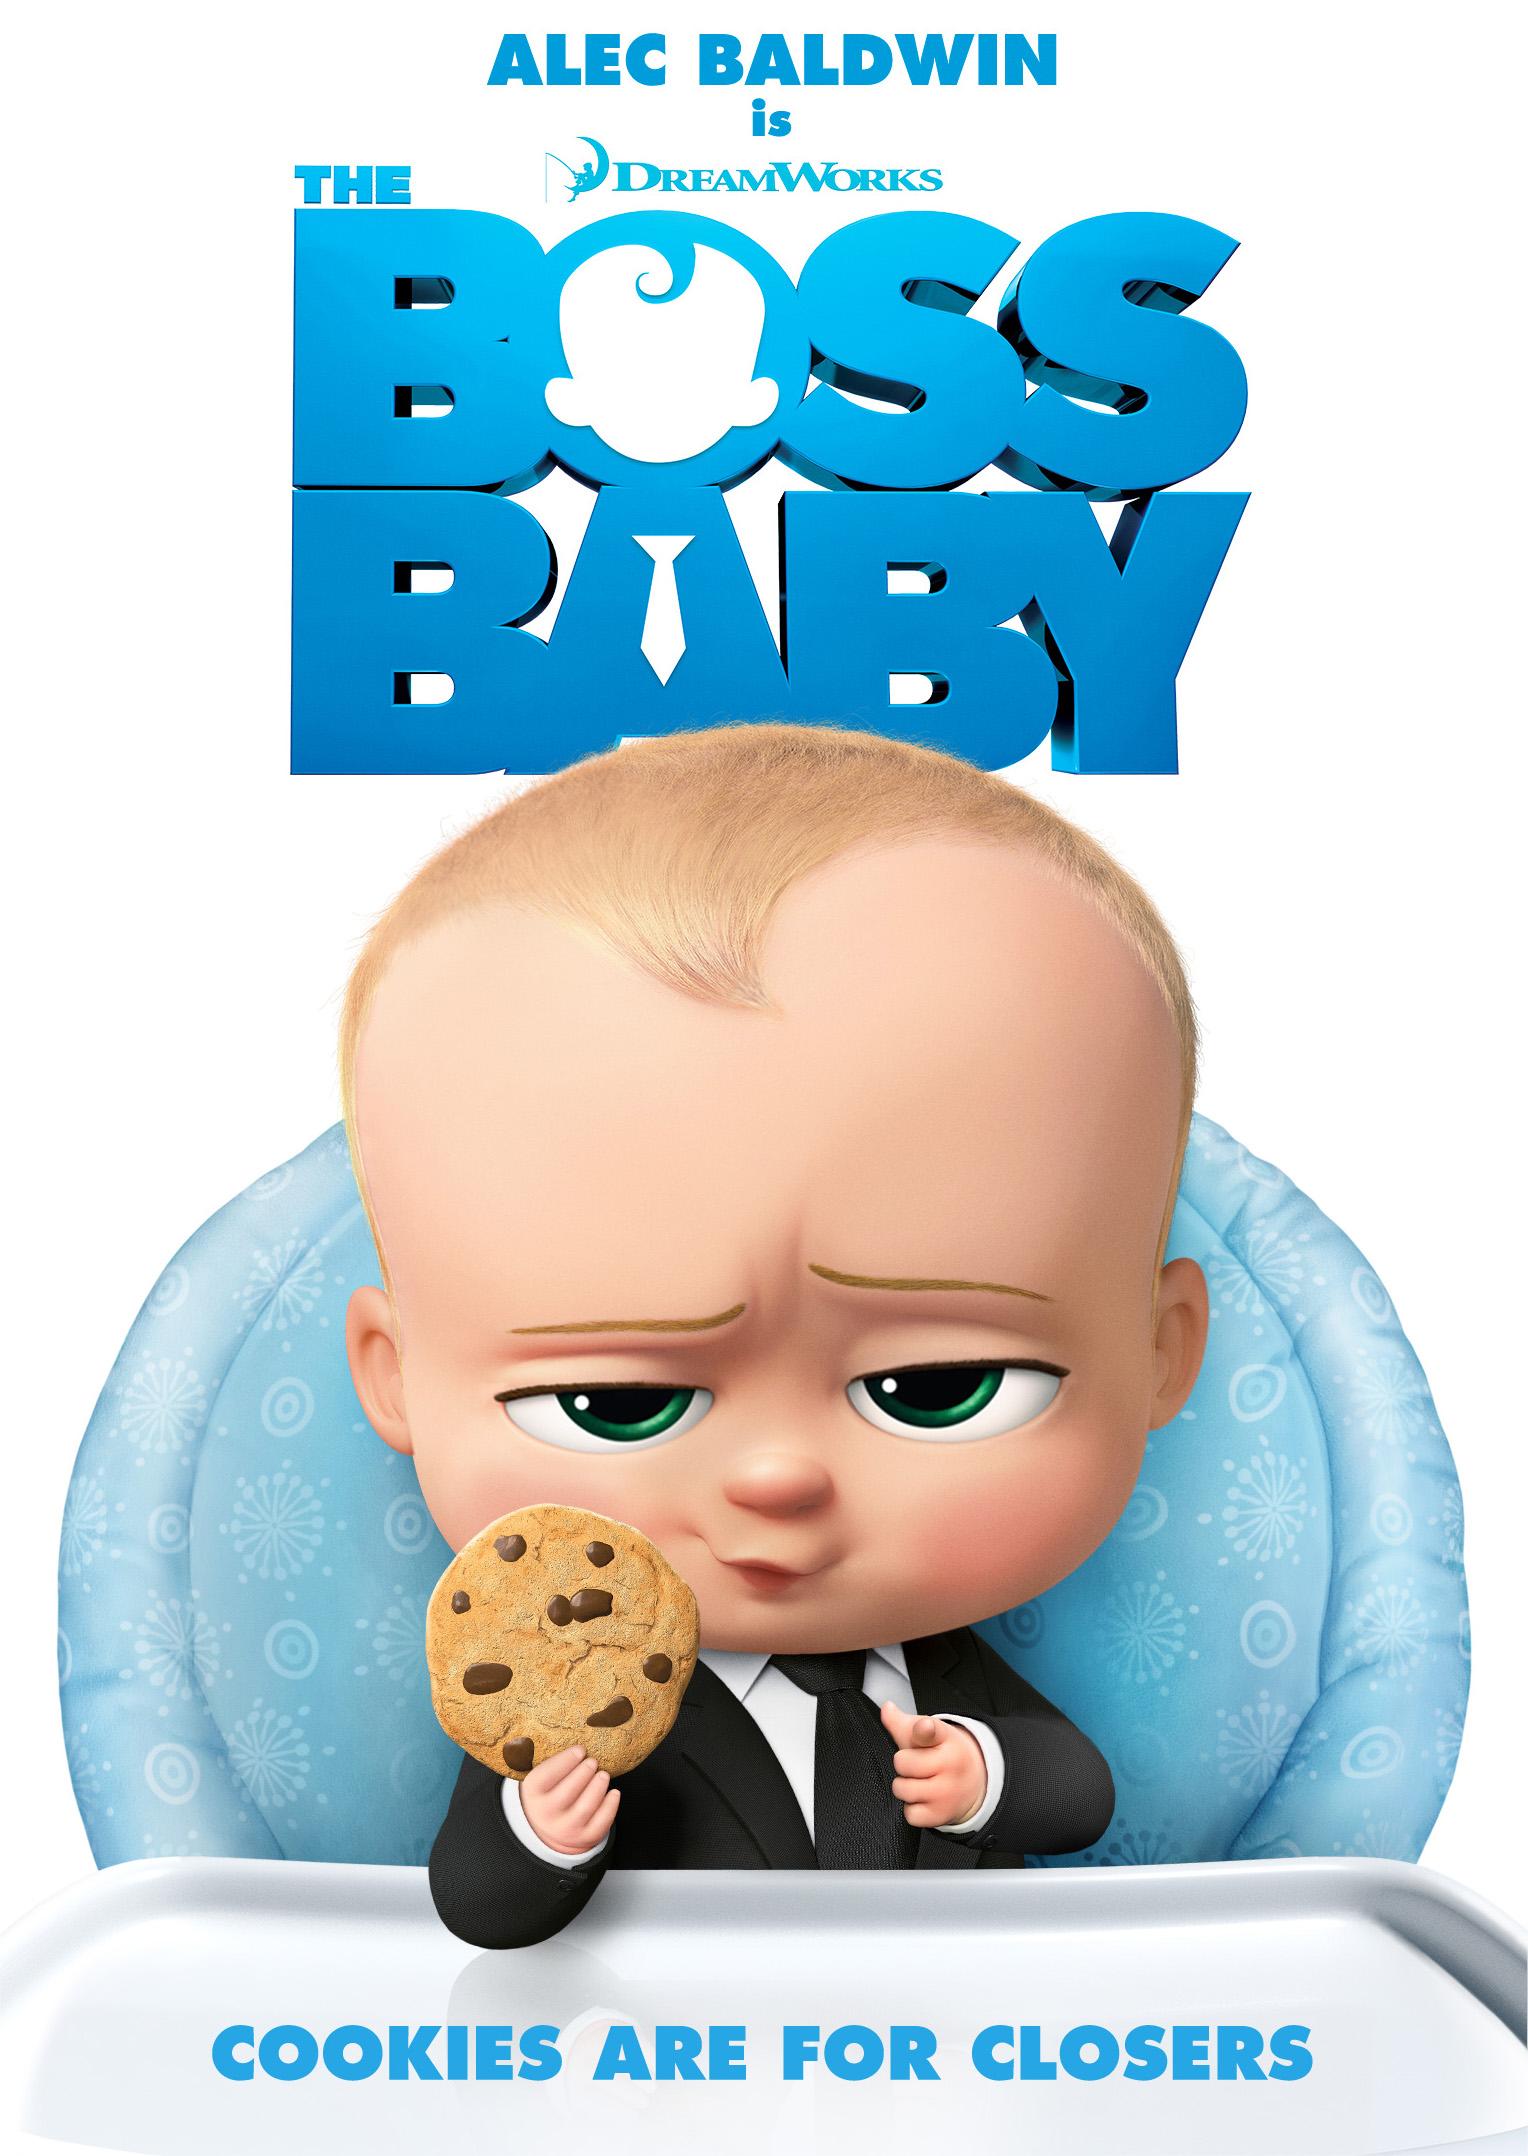 Boss Baby Alec Baldwin